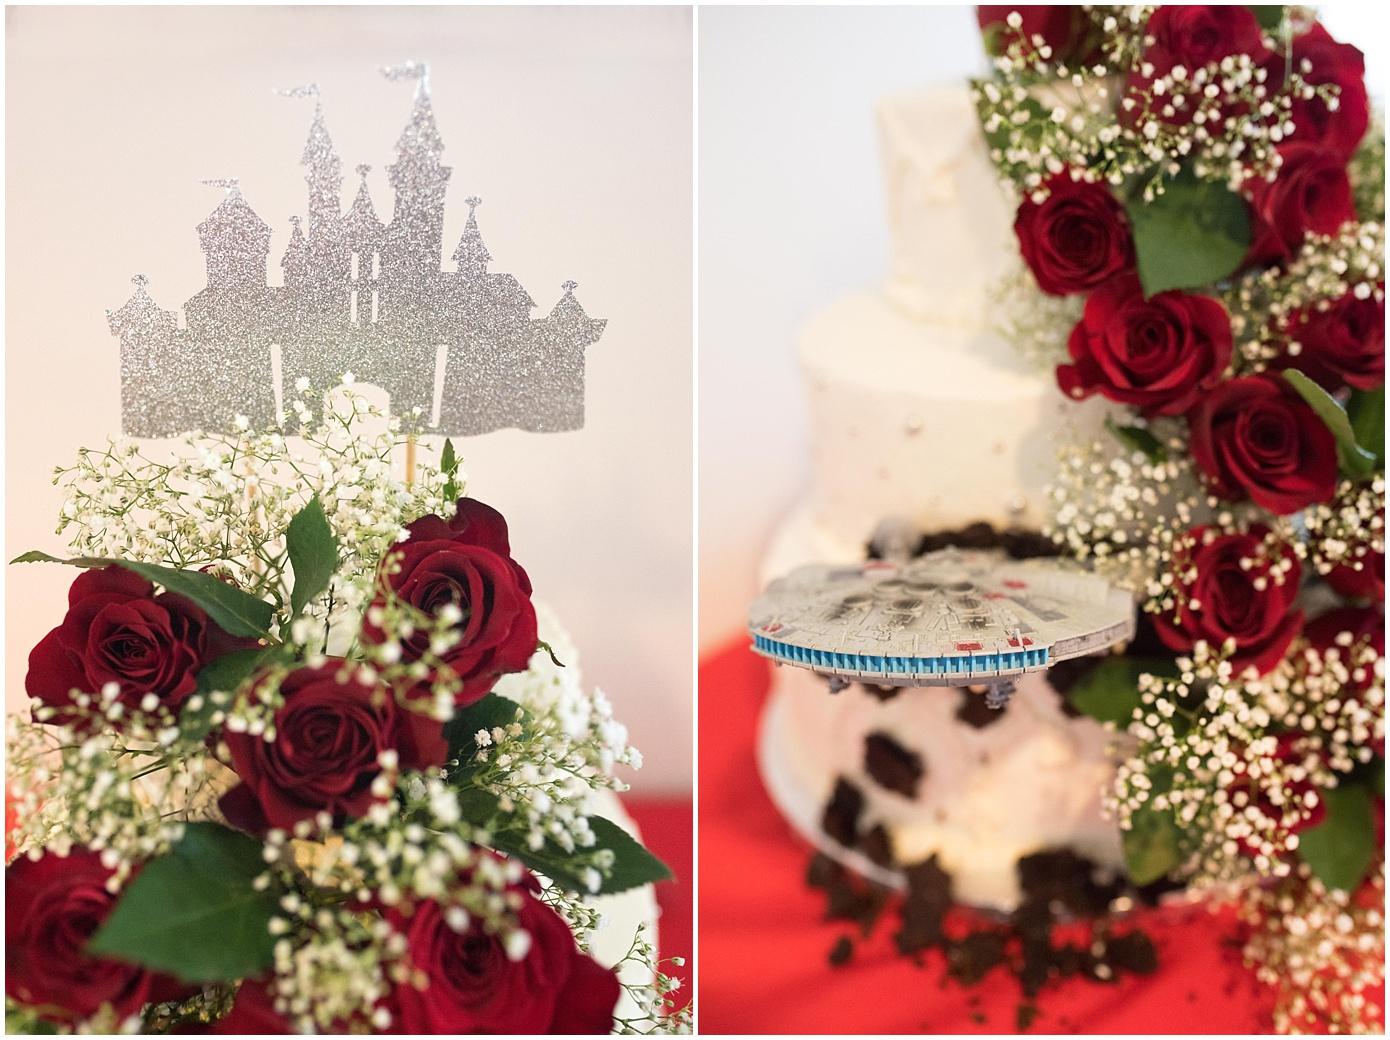 kayla kitts photography-justine-brian-wedding-balloon-fiesta_0042.jpg